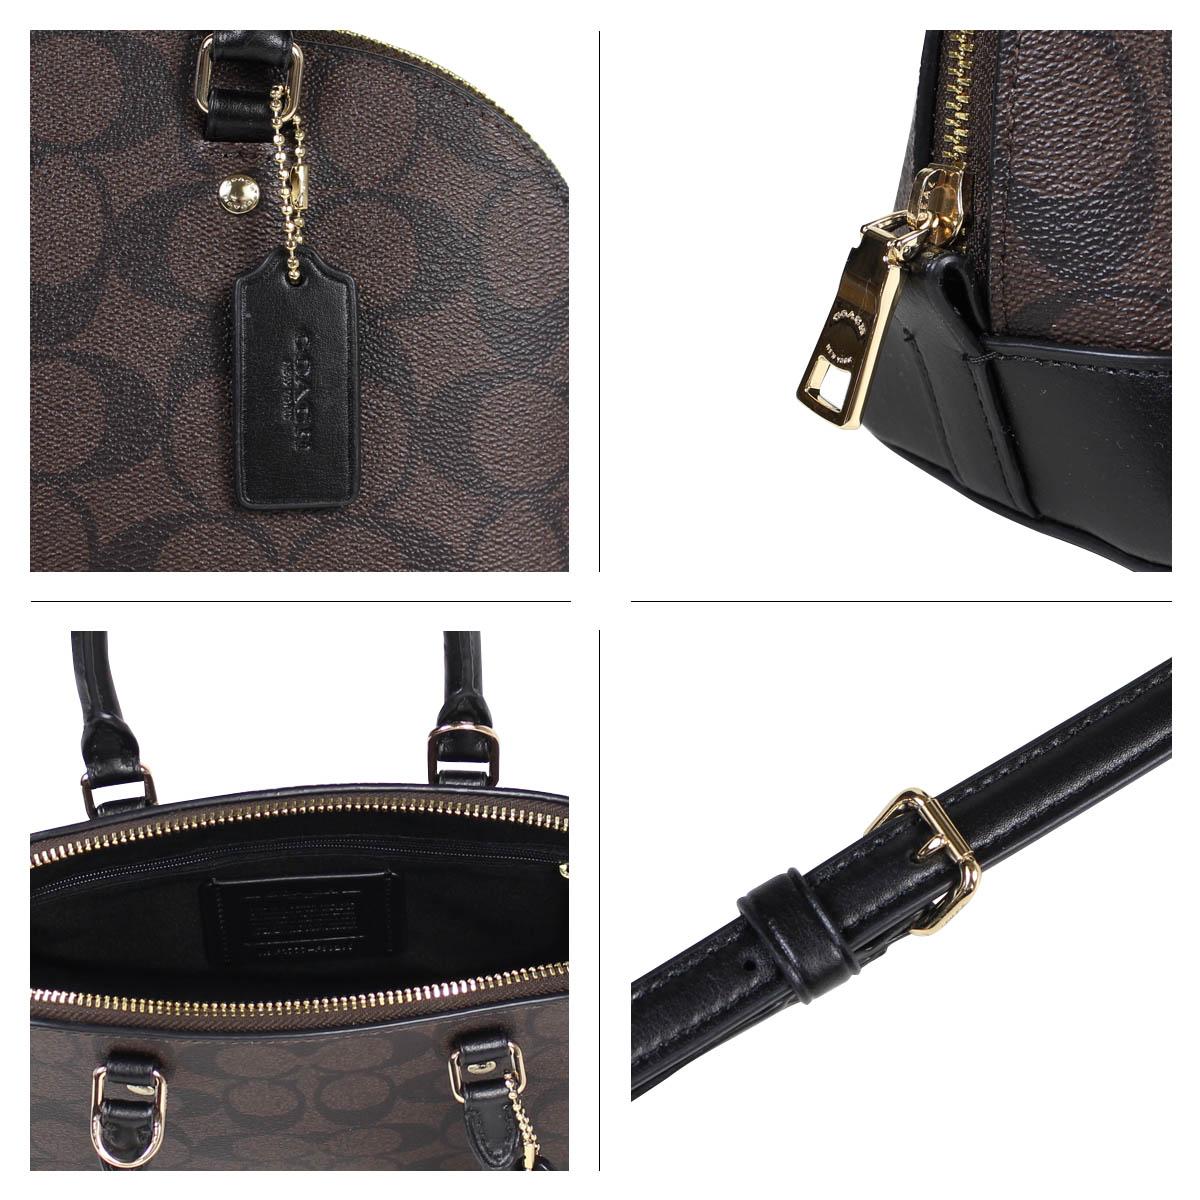 8f4b62b80 ... COACH coach bag shoulder bag Lady's MINI SIERRA SATCHEL IN SIGNATURE  COATED CANVAS F59295 brown